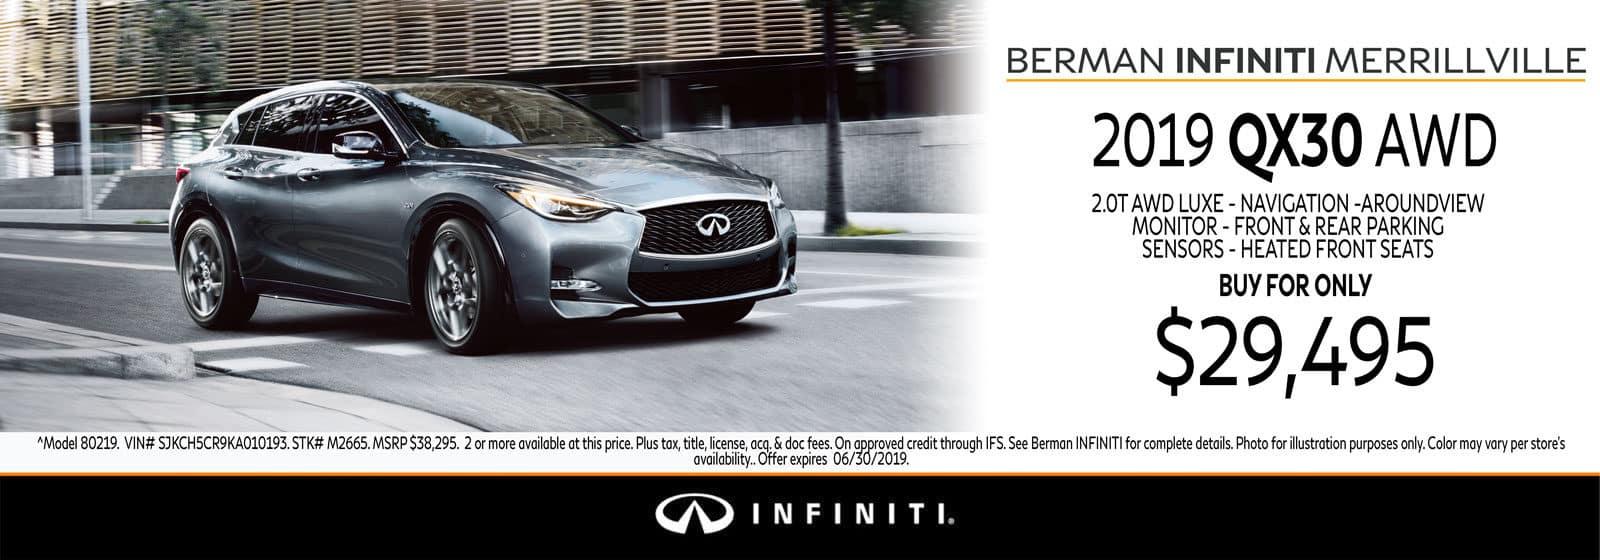 New 2019 INFINITI QX30 June Offer at Berman INFINITI of Merrillville!